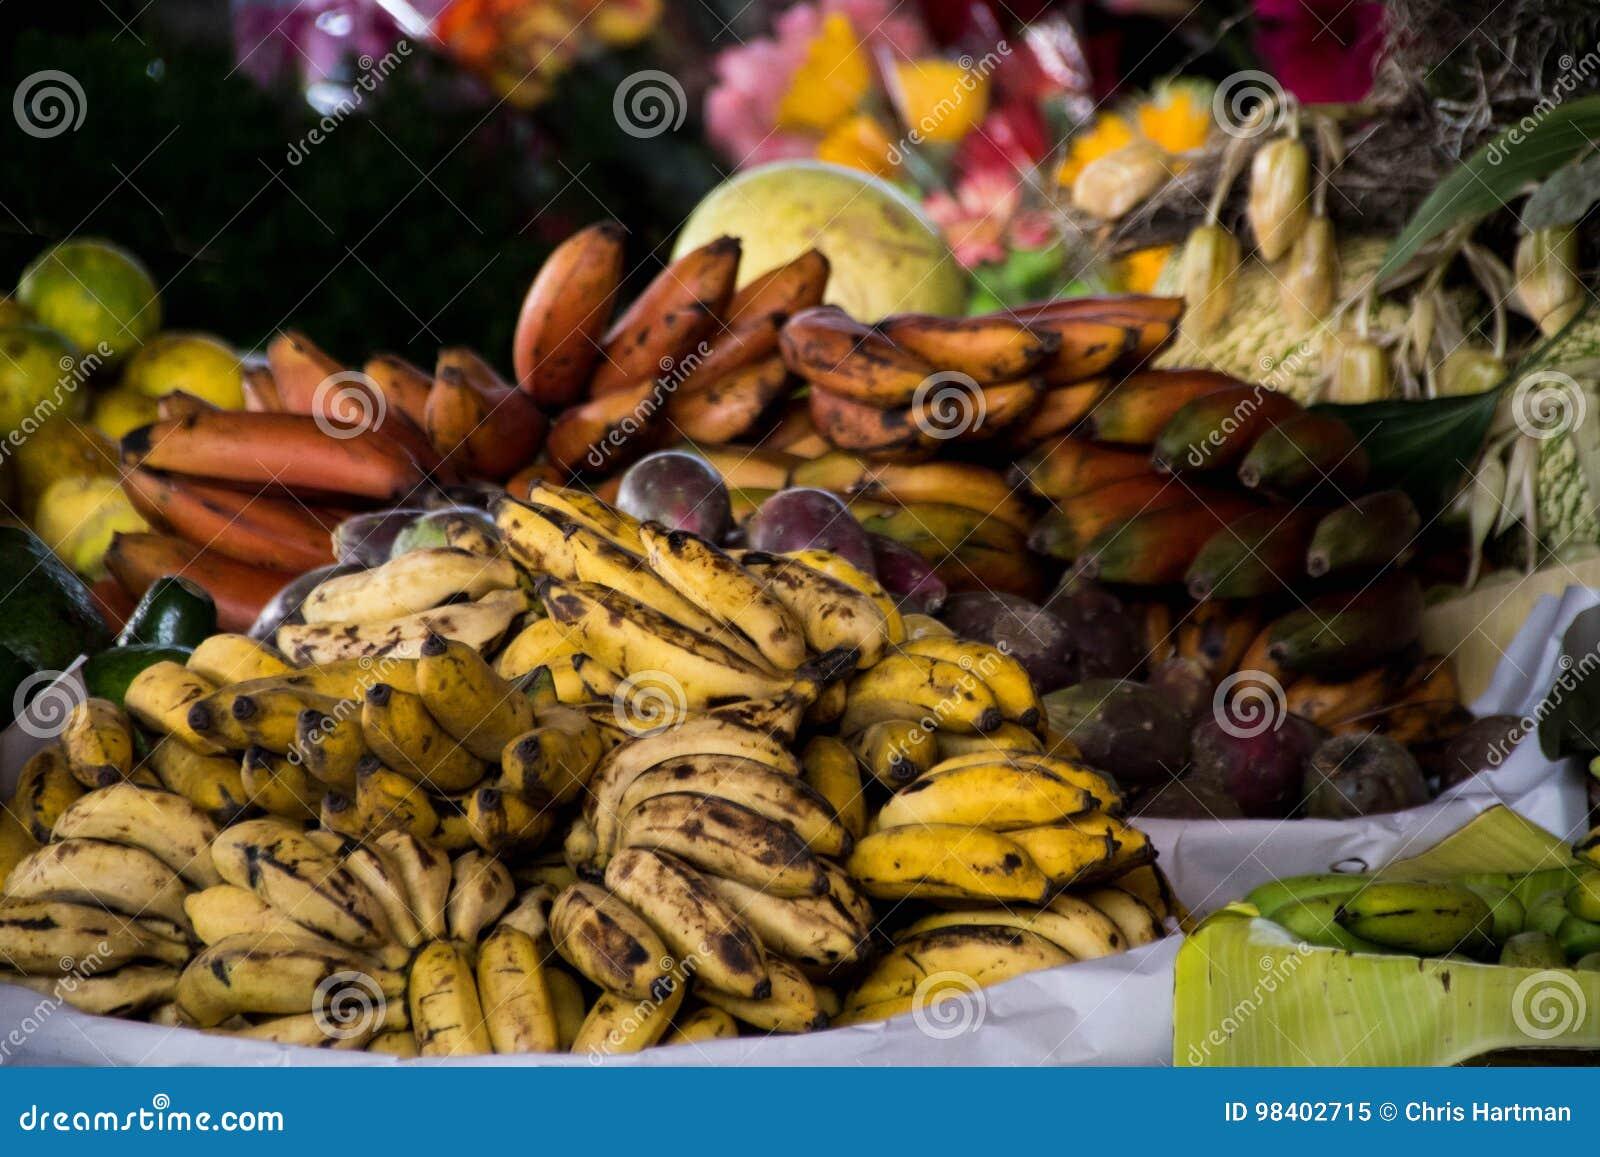 Markets of Antigua